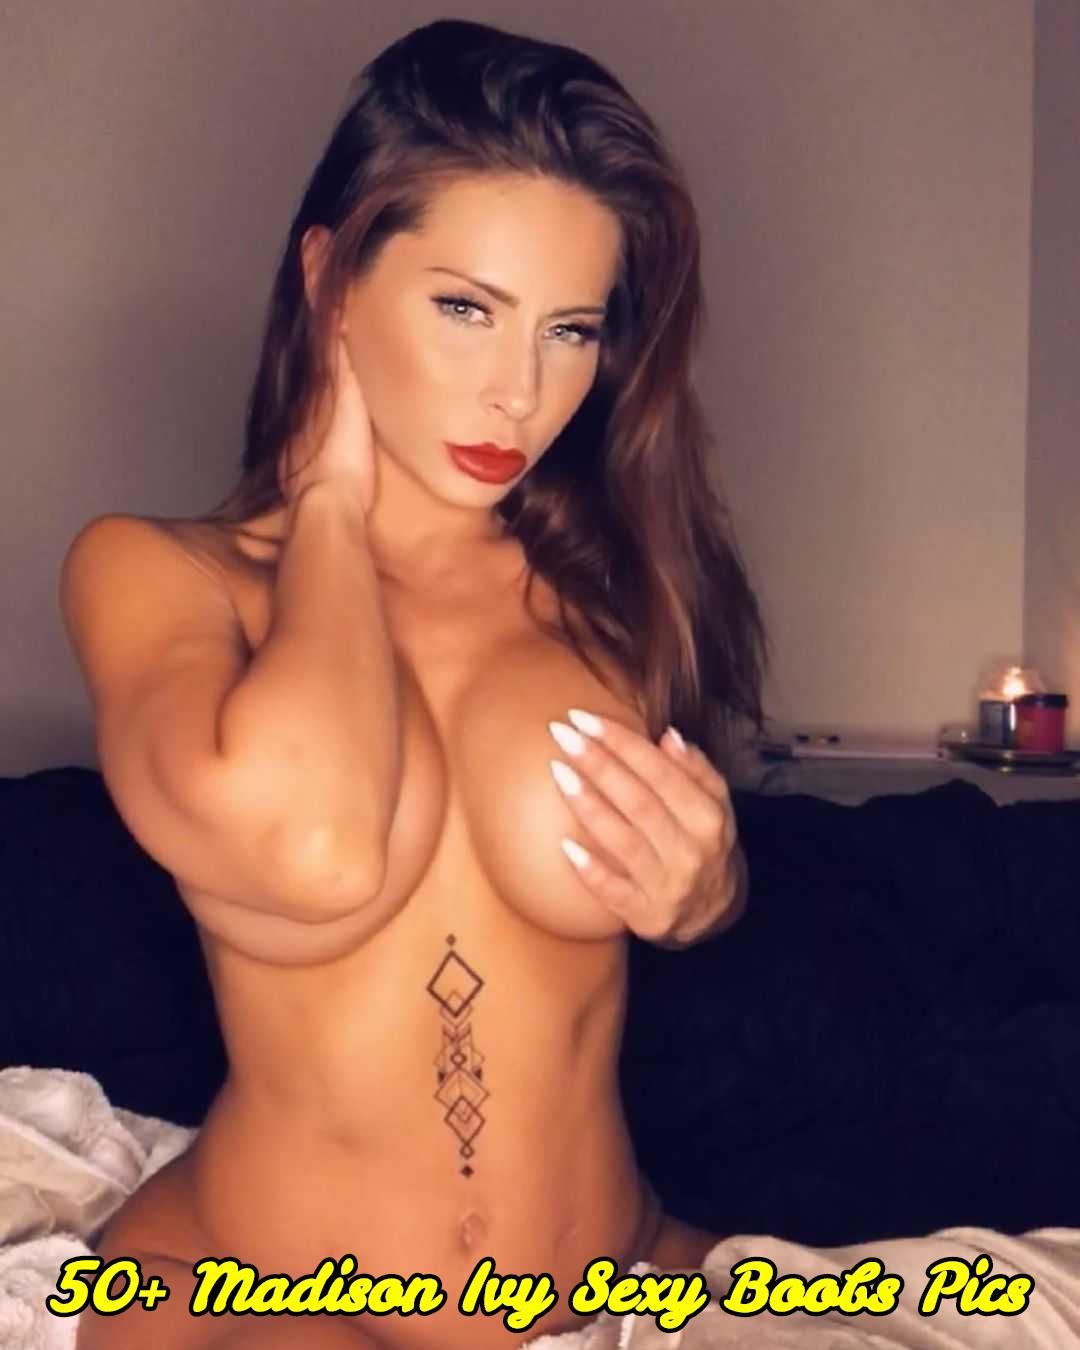 Madison Ivy sexy boobs pics